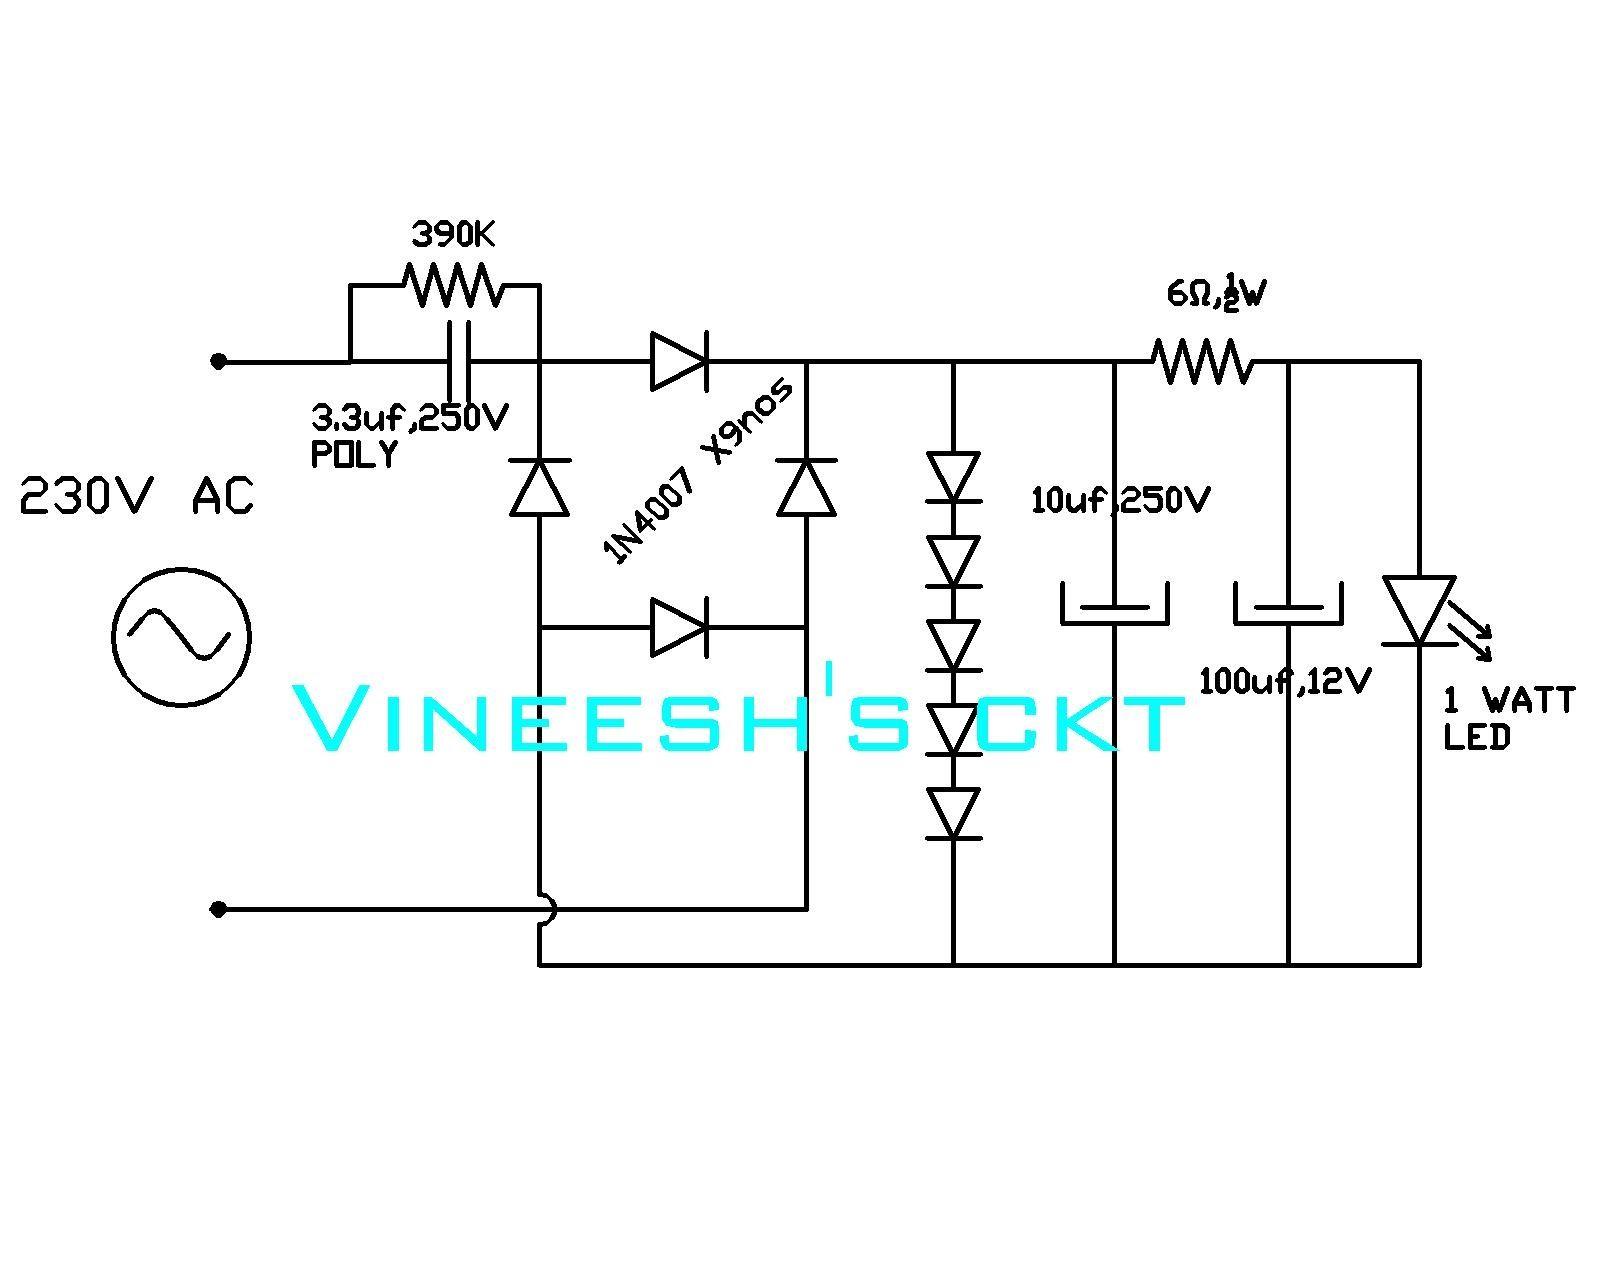 1 Watt Led Light Circuit Diagram httpscartclubus Pinterest